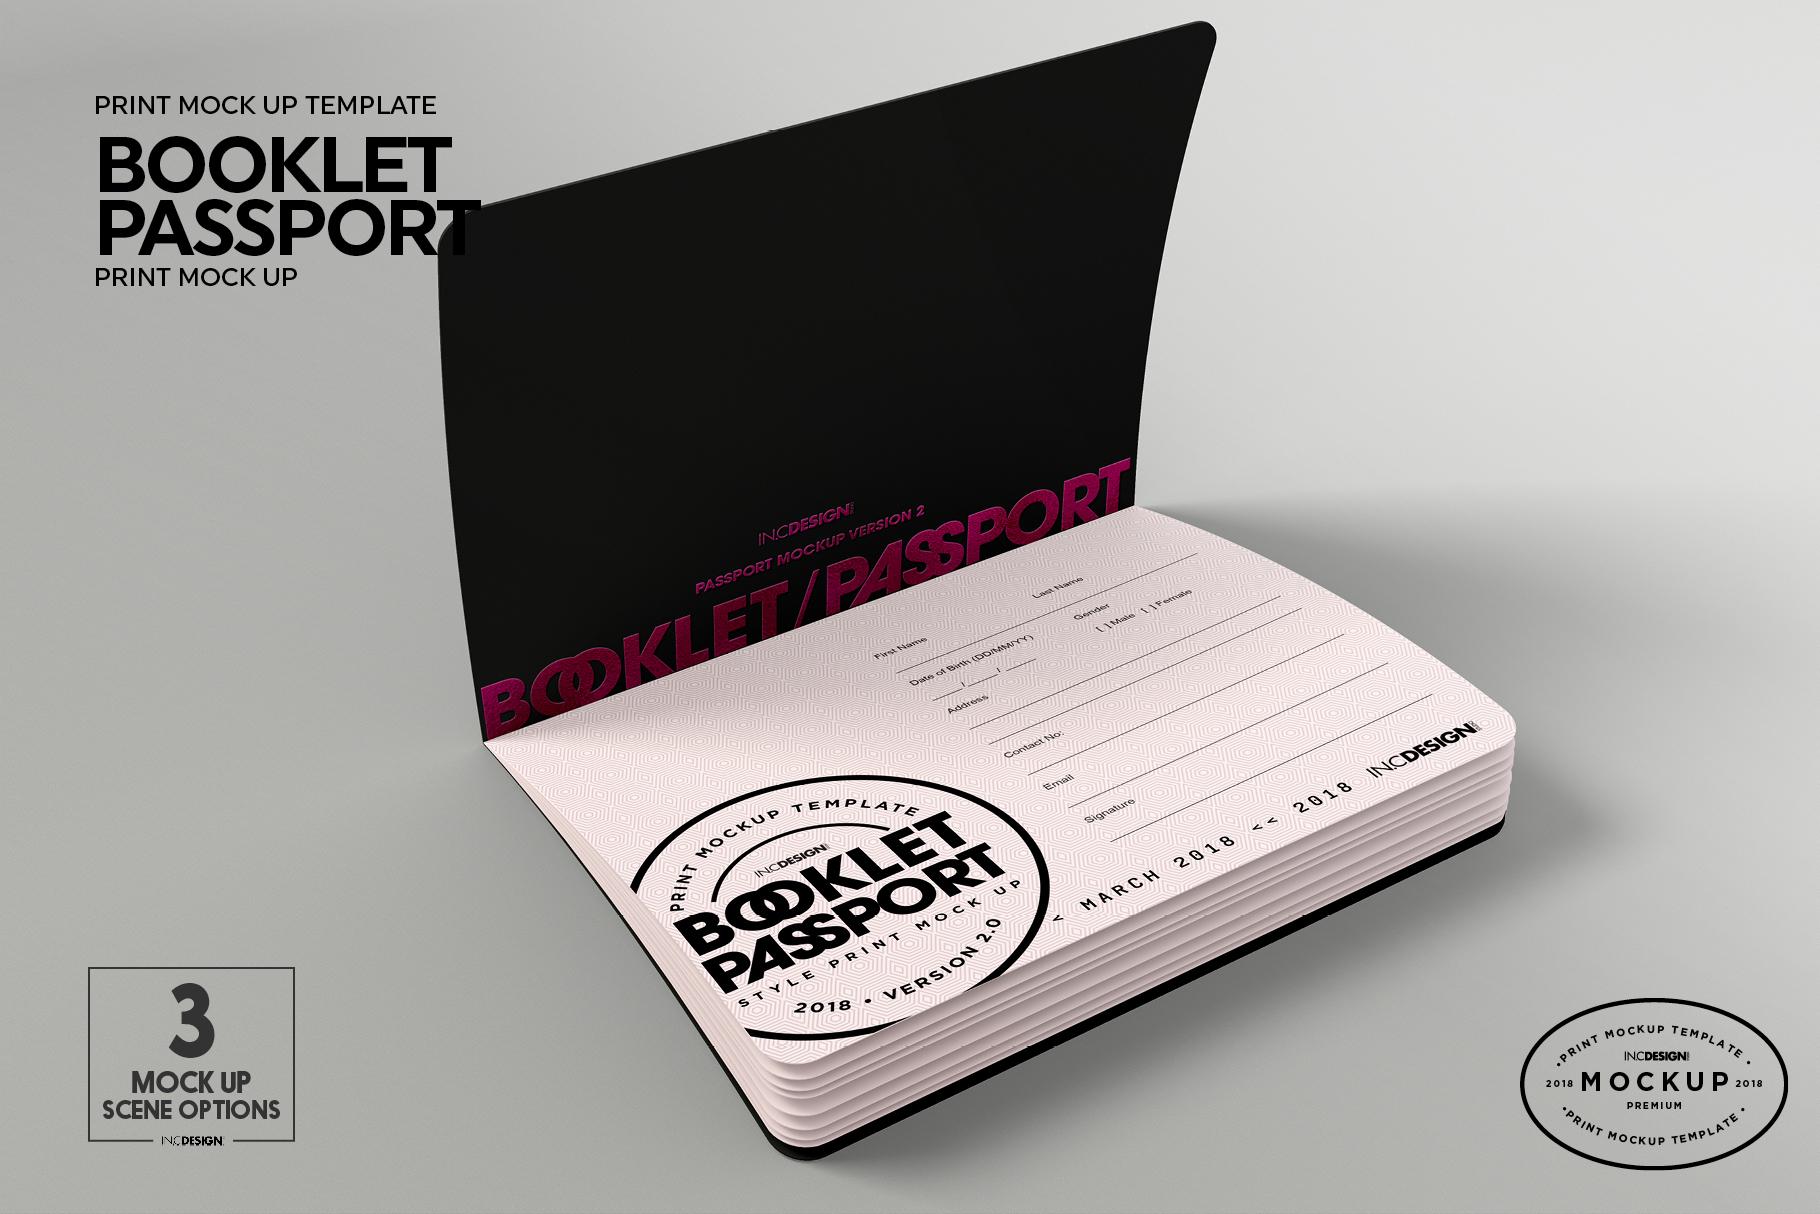 Booklet Passport Print MockUp example image 9